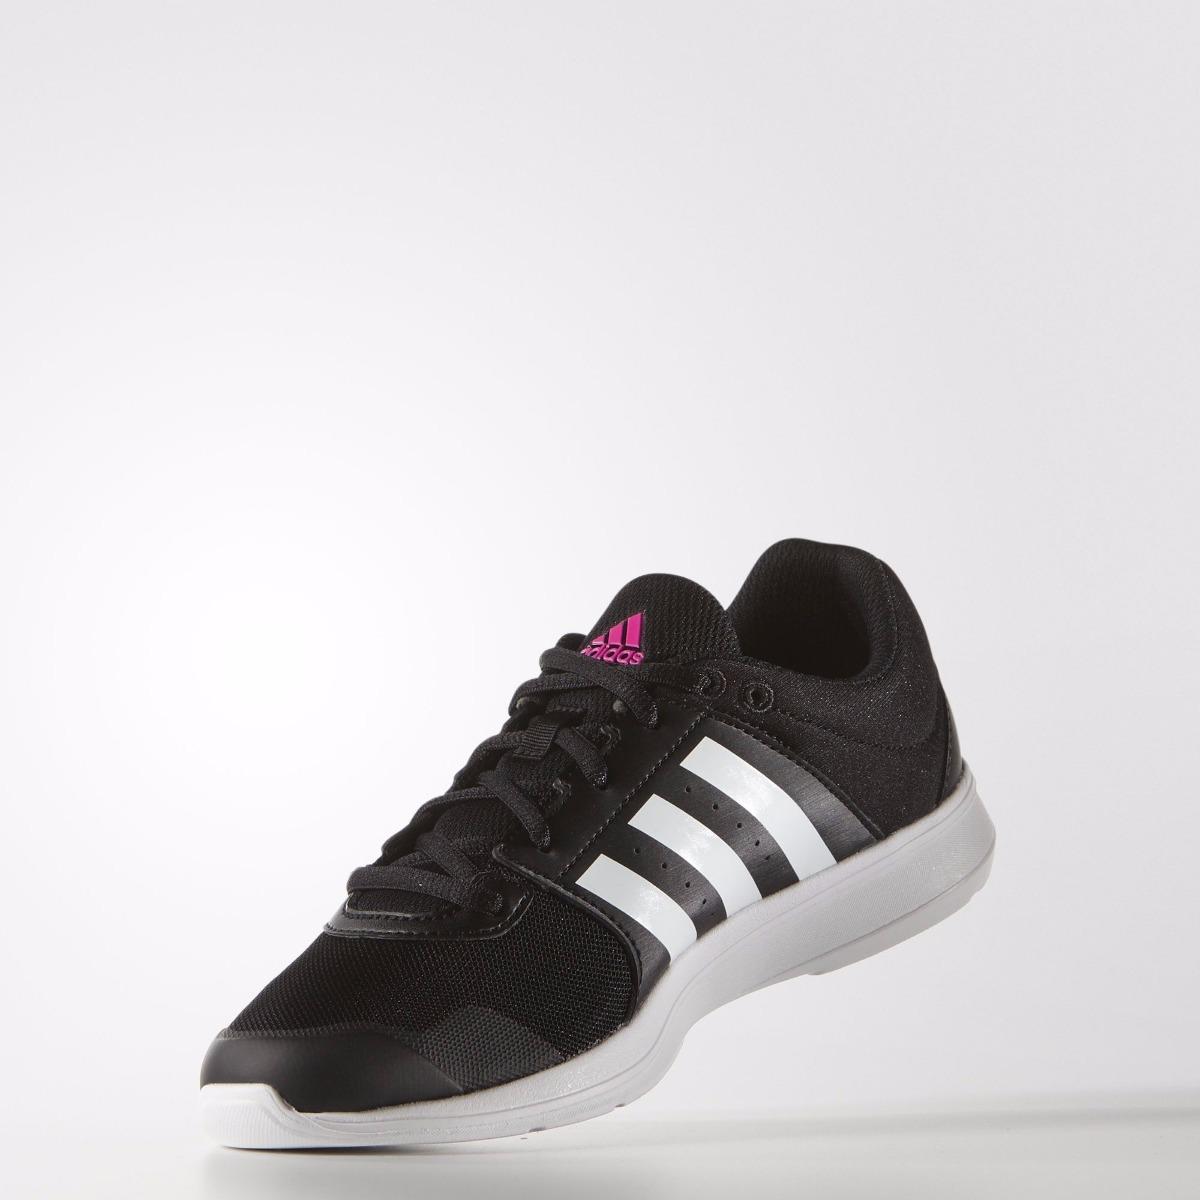 sneakers for cheap 0dcc1 6e684 zapatillas adidas training crossfit essential fun 2 w af5873. Cargando zoom.